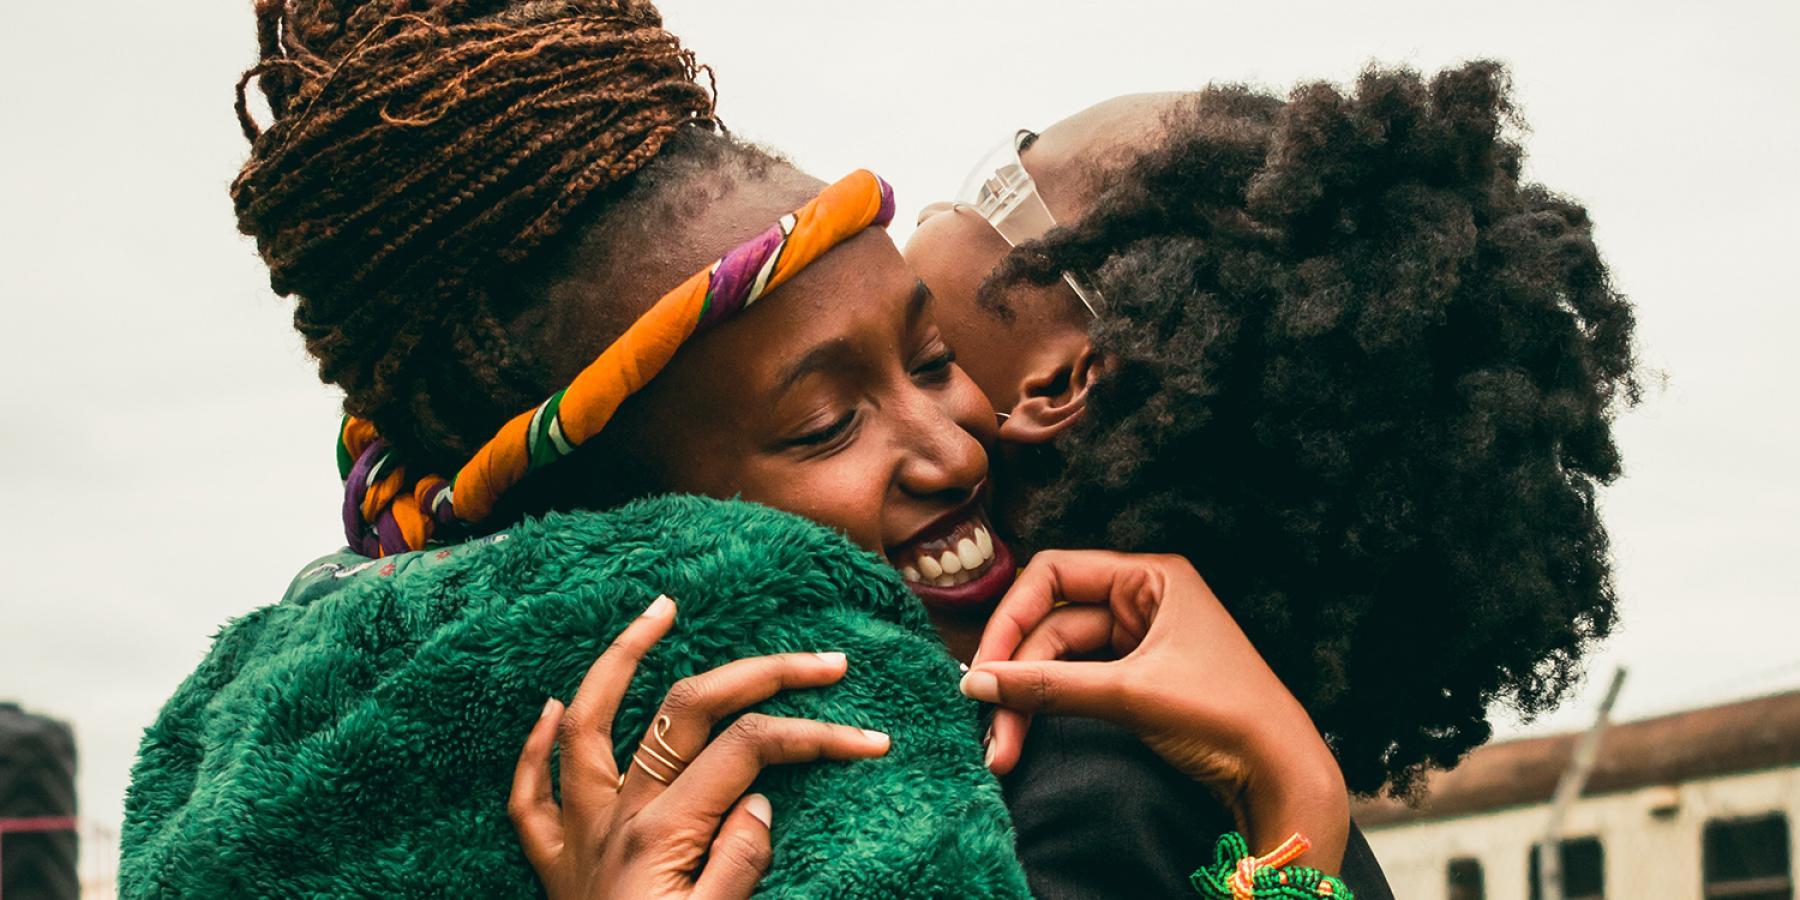 World Cancer Day 'I Am And I Will' campaign © Shalom Mwenesi for Unsplash